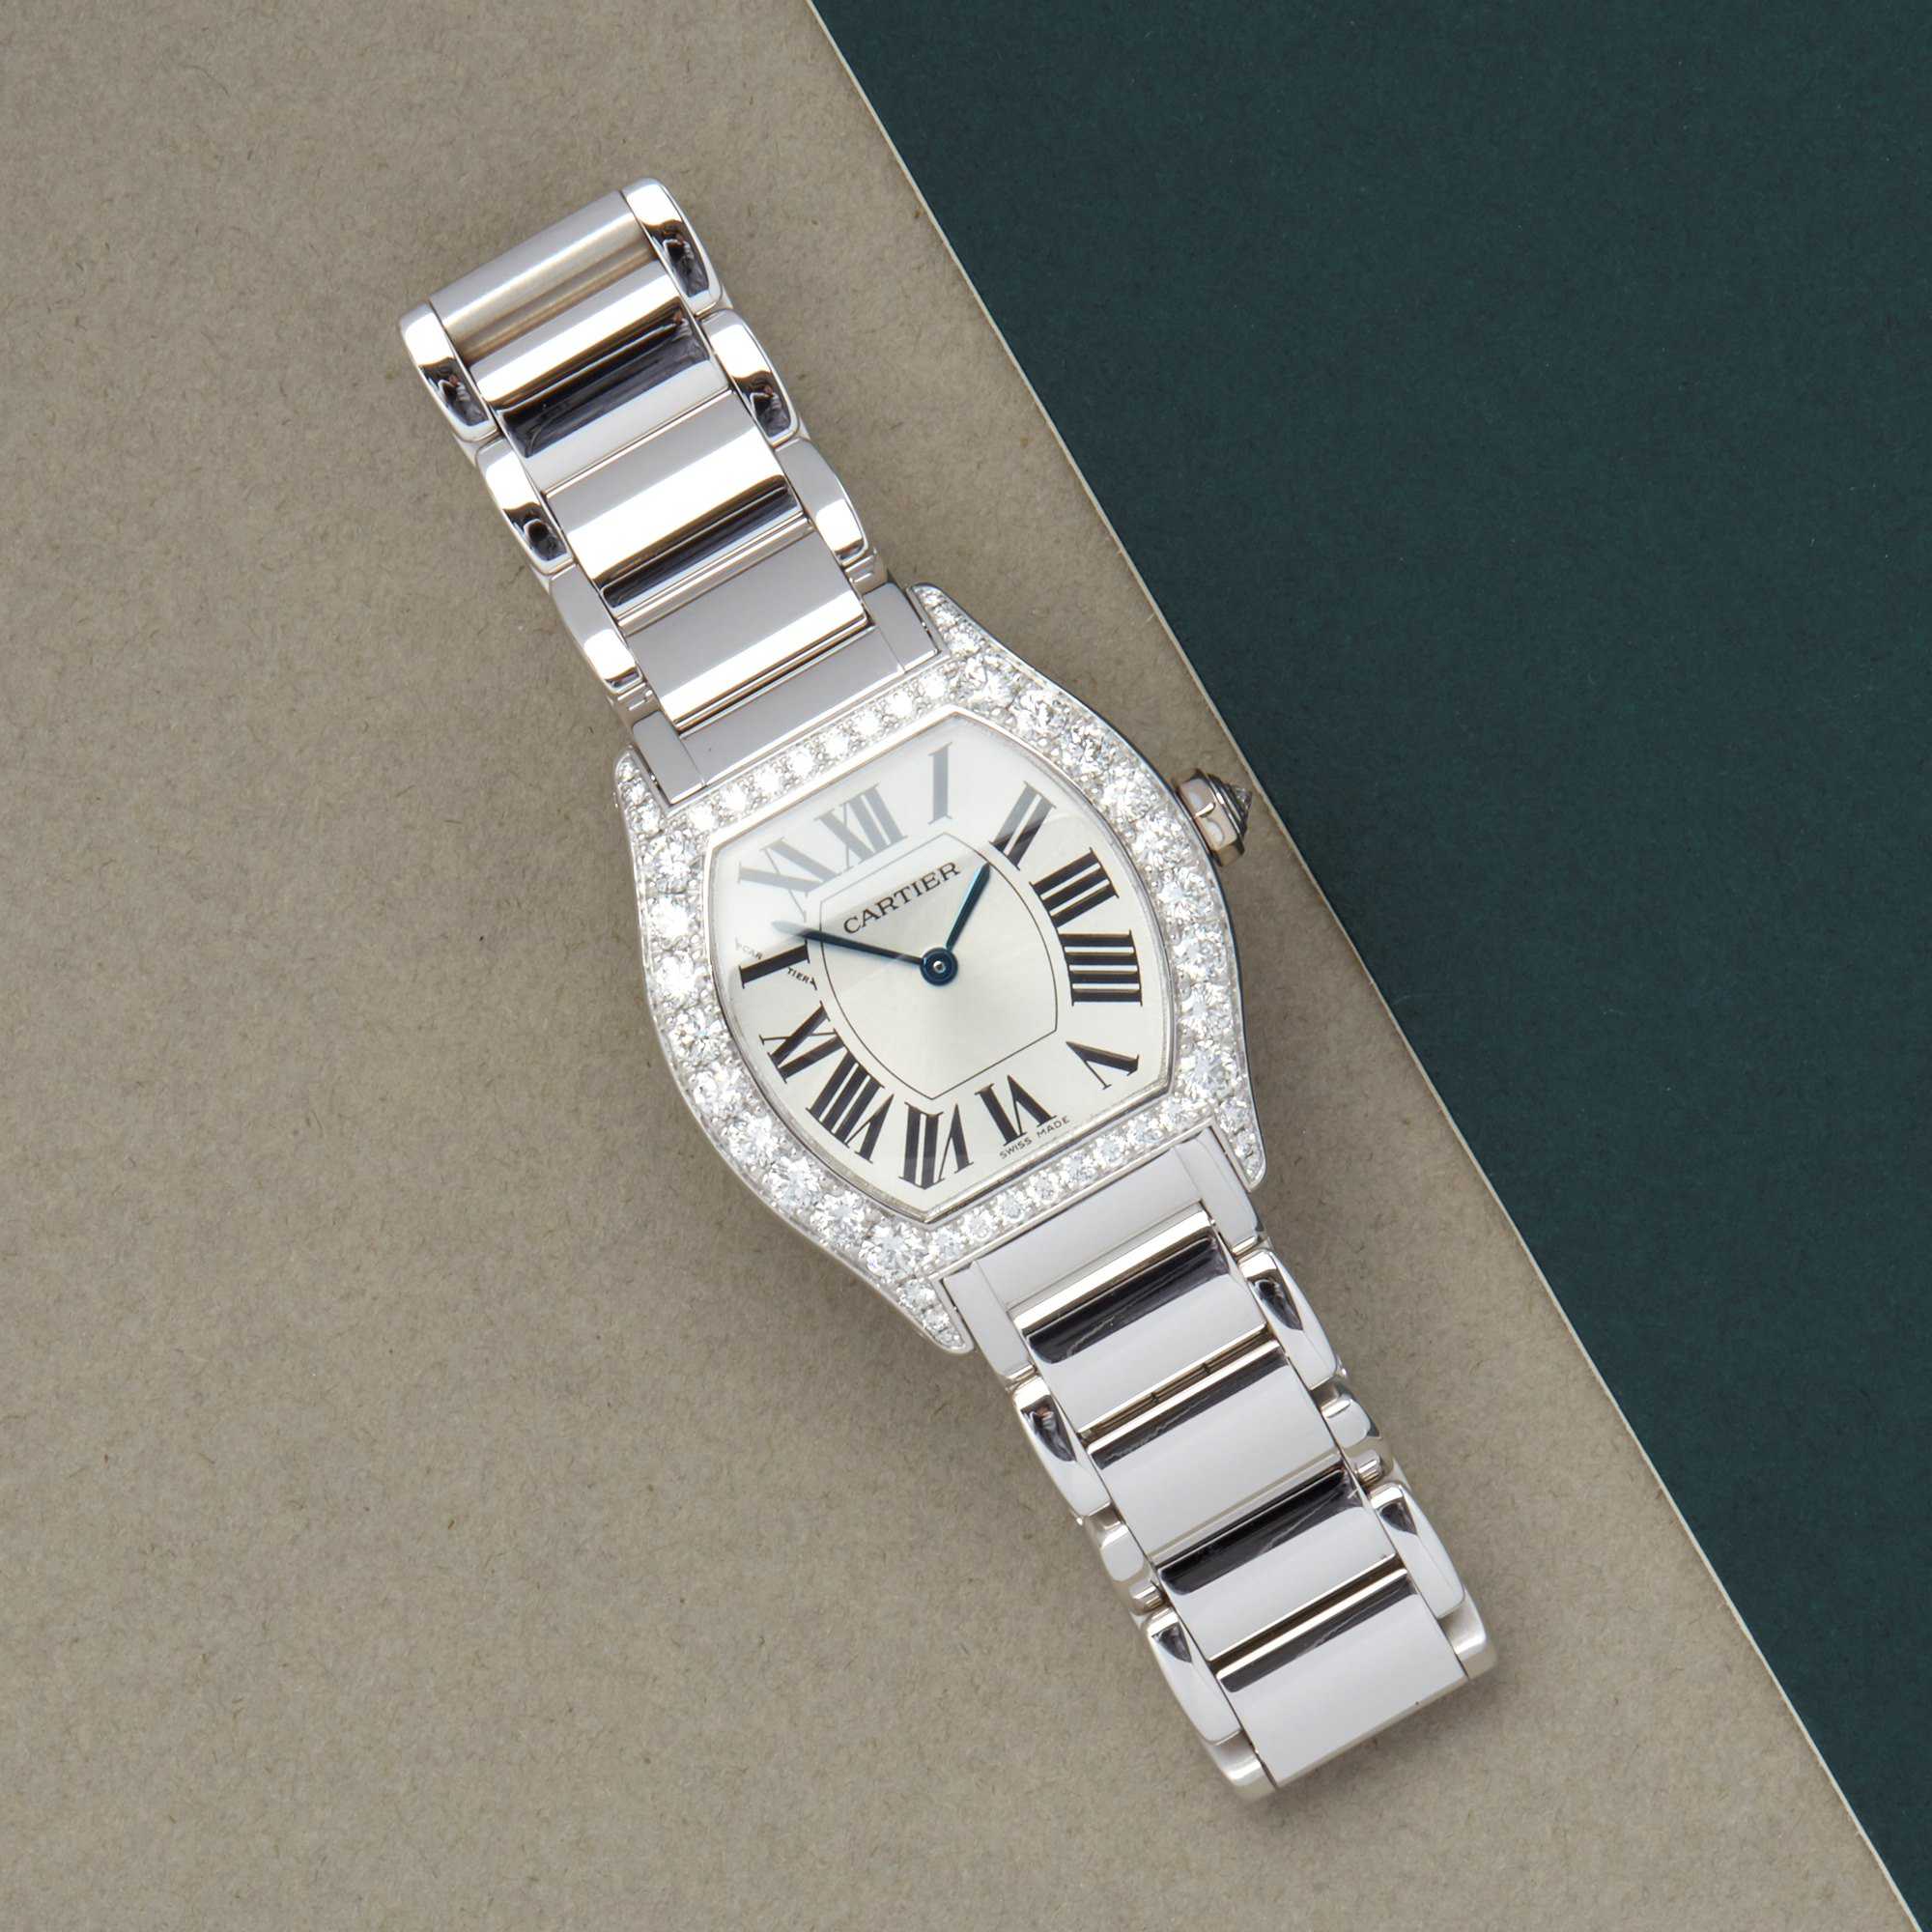 Cartier Tortue Factory Diamond 18K White Gold WA5072W9 or 2644